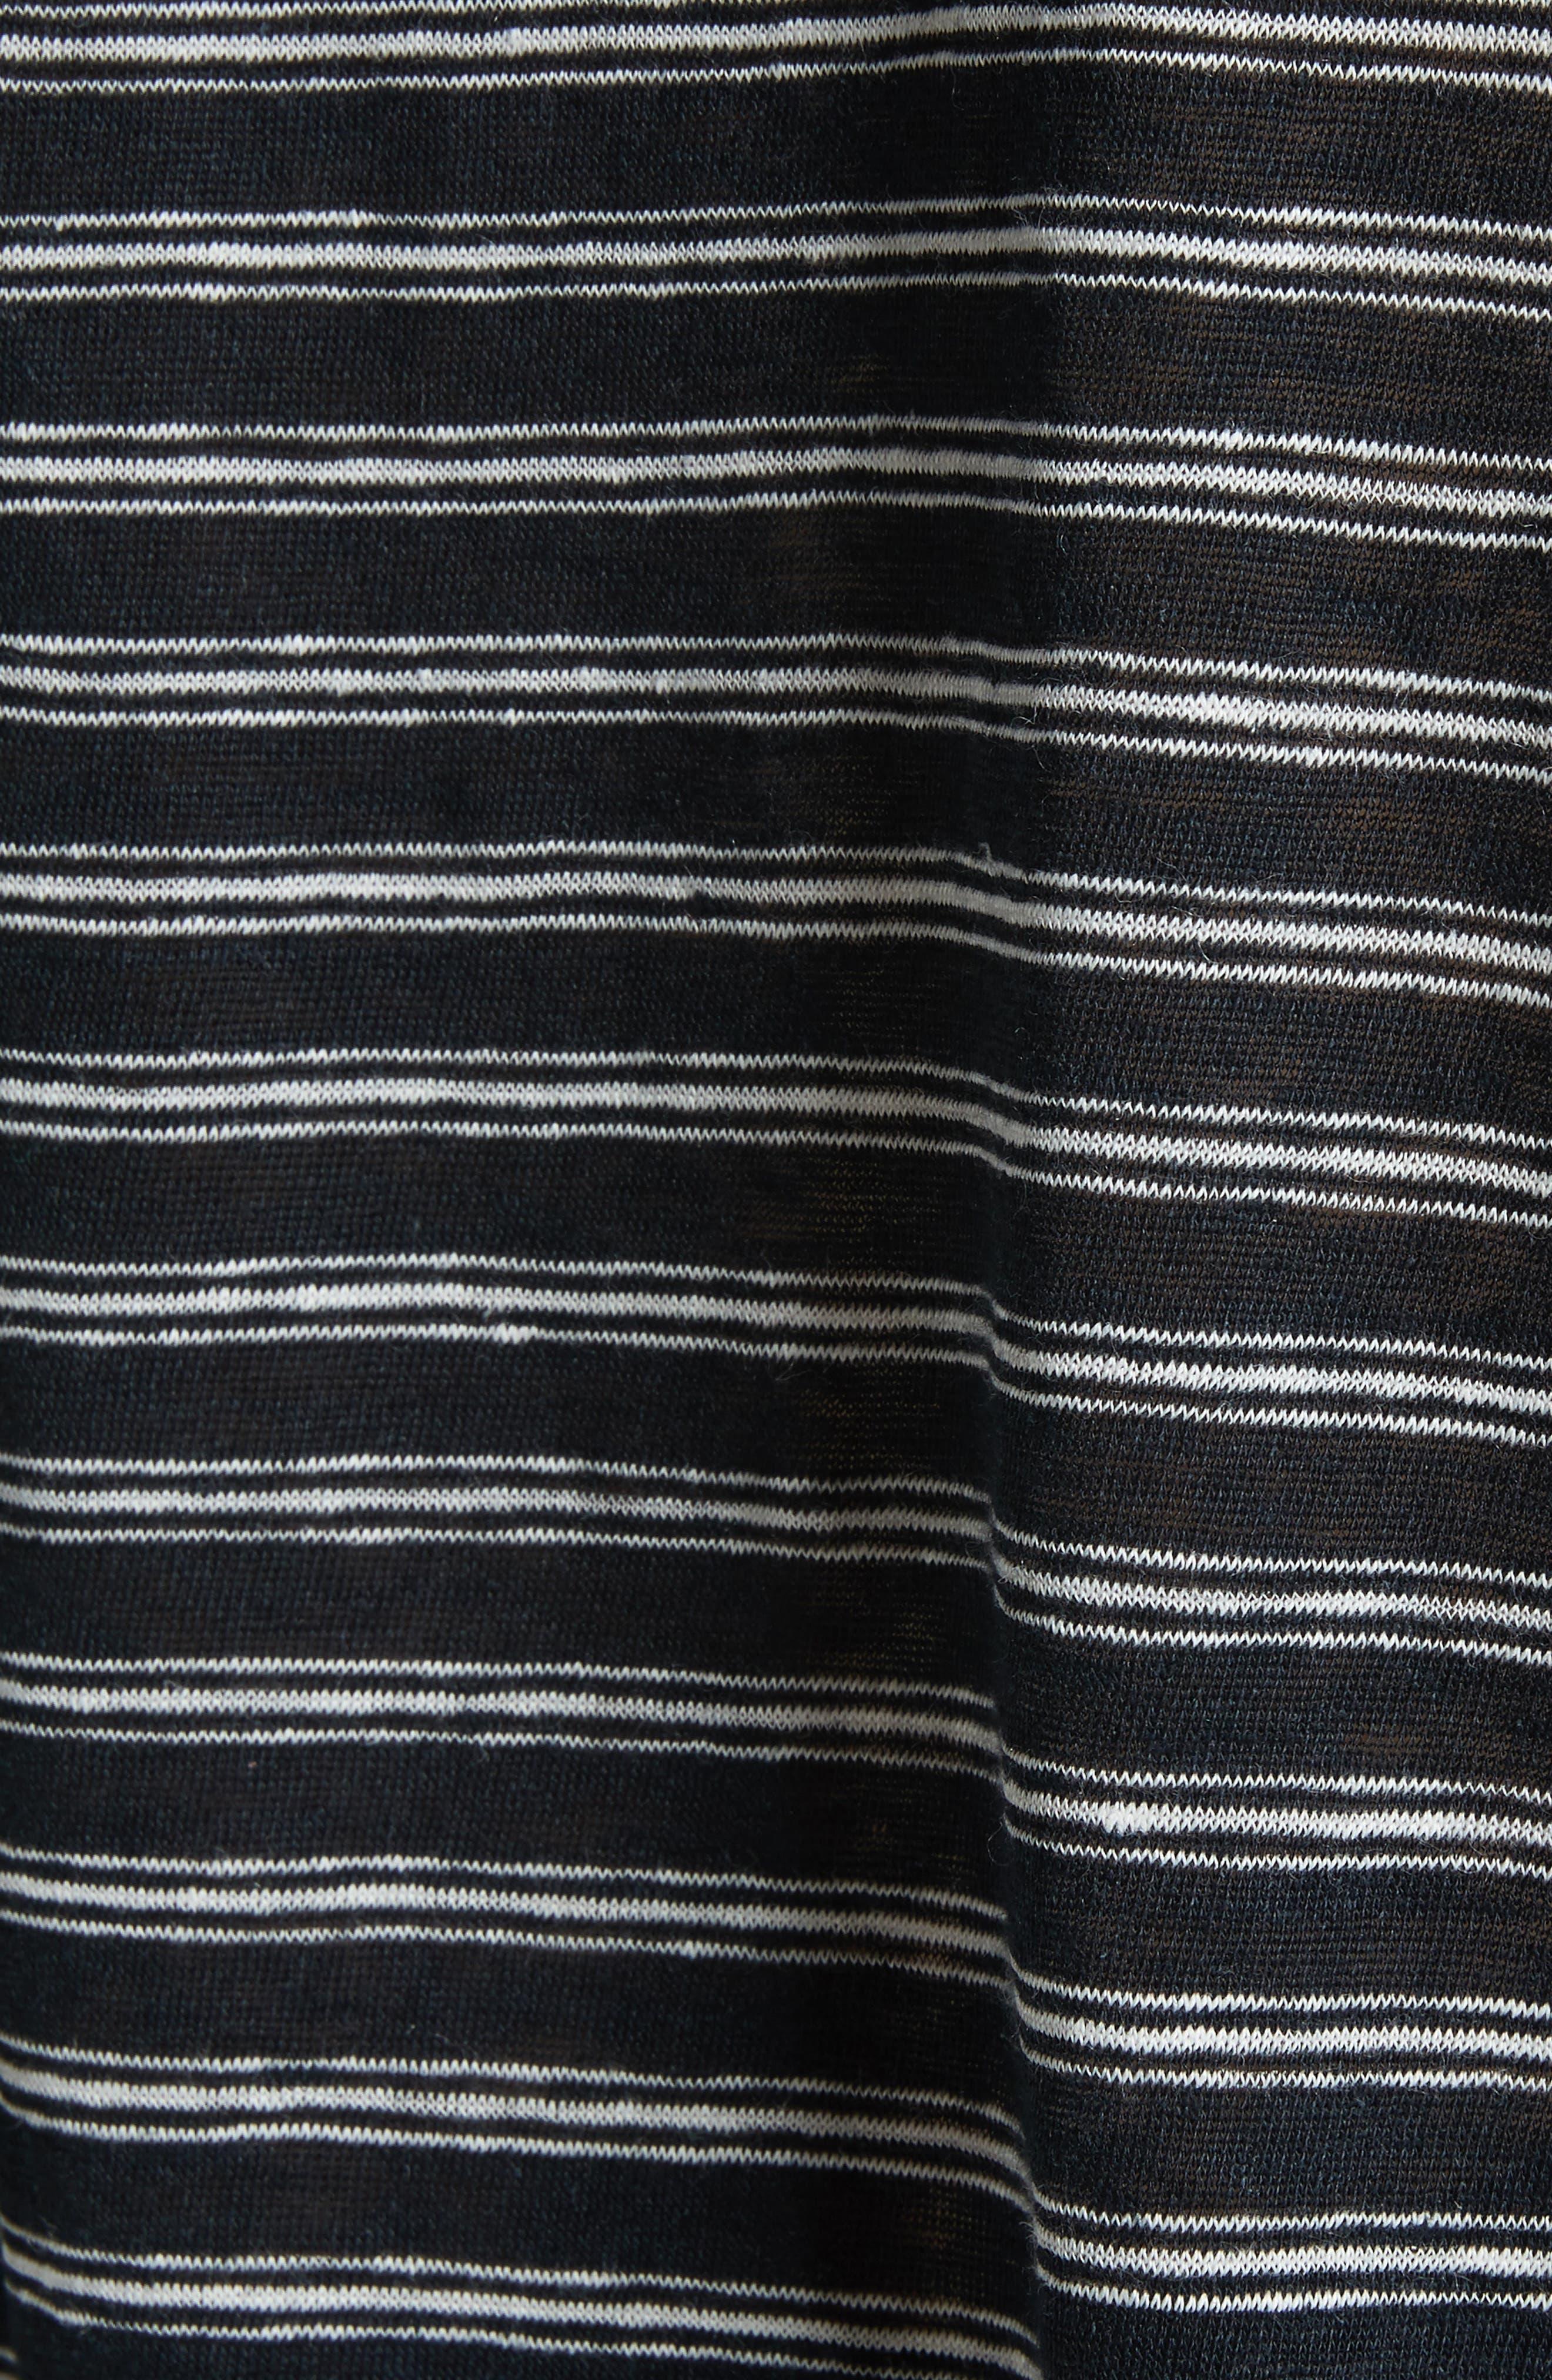 Stripe Linen Knit Top,                             Alternate thumbnail 5, color,                             904